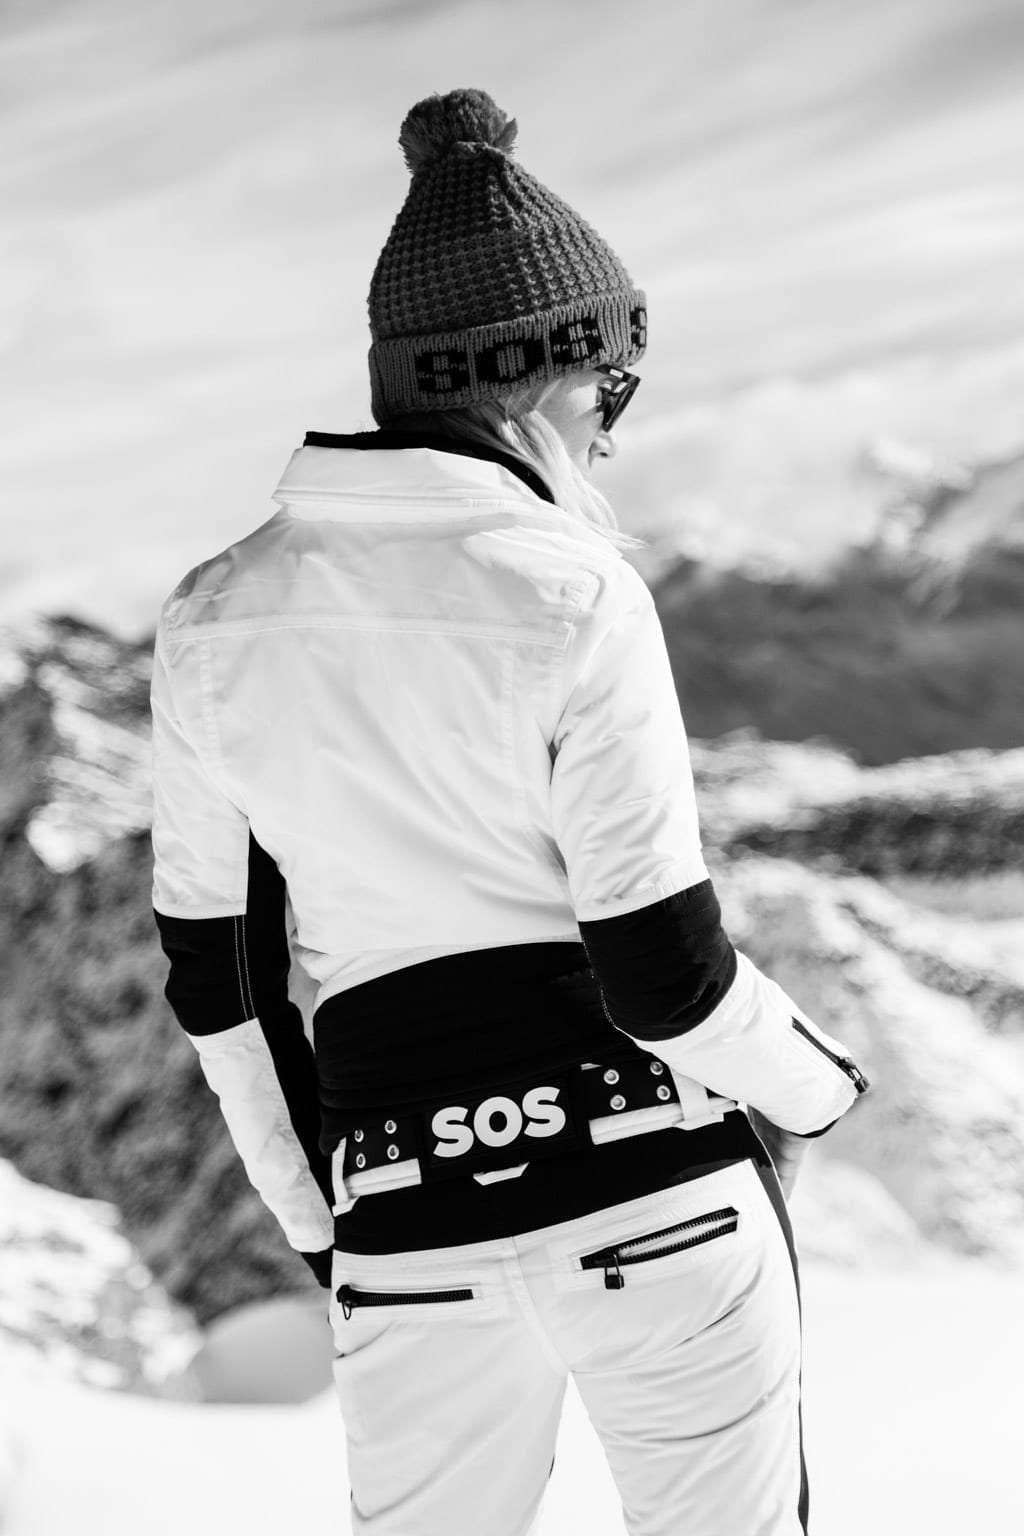 ck-constantlyk-com-karin-kaswurm-soelden-tirol-skiiing-apres-ski-fashion-gletscher-11